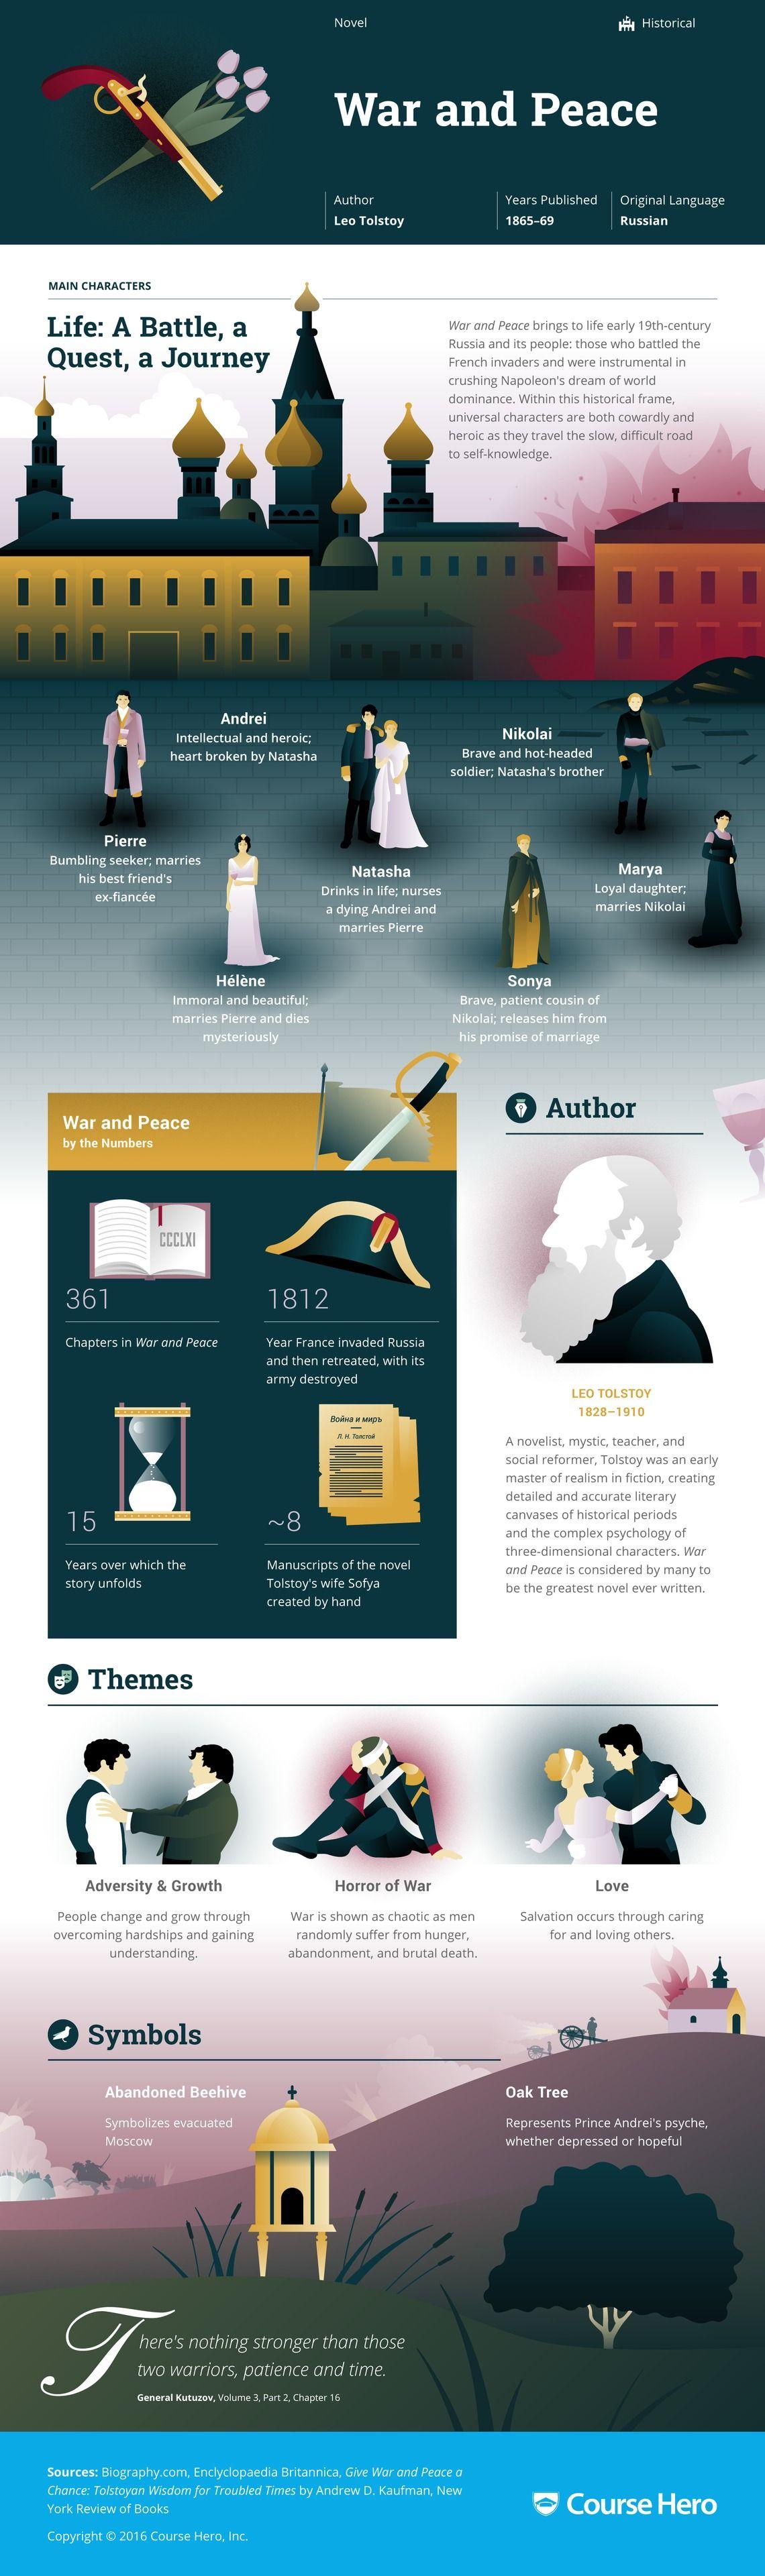 Harvard Classics Five-Foot Shelf of Books Reading Guide ...